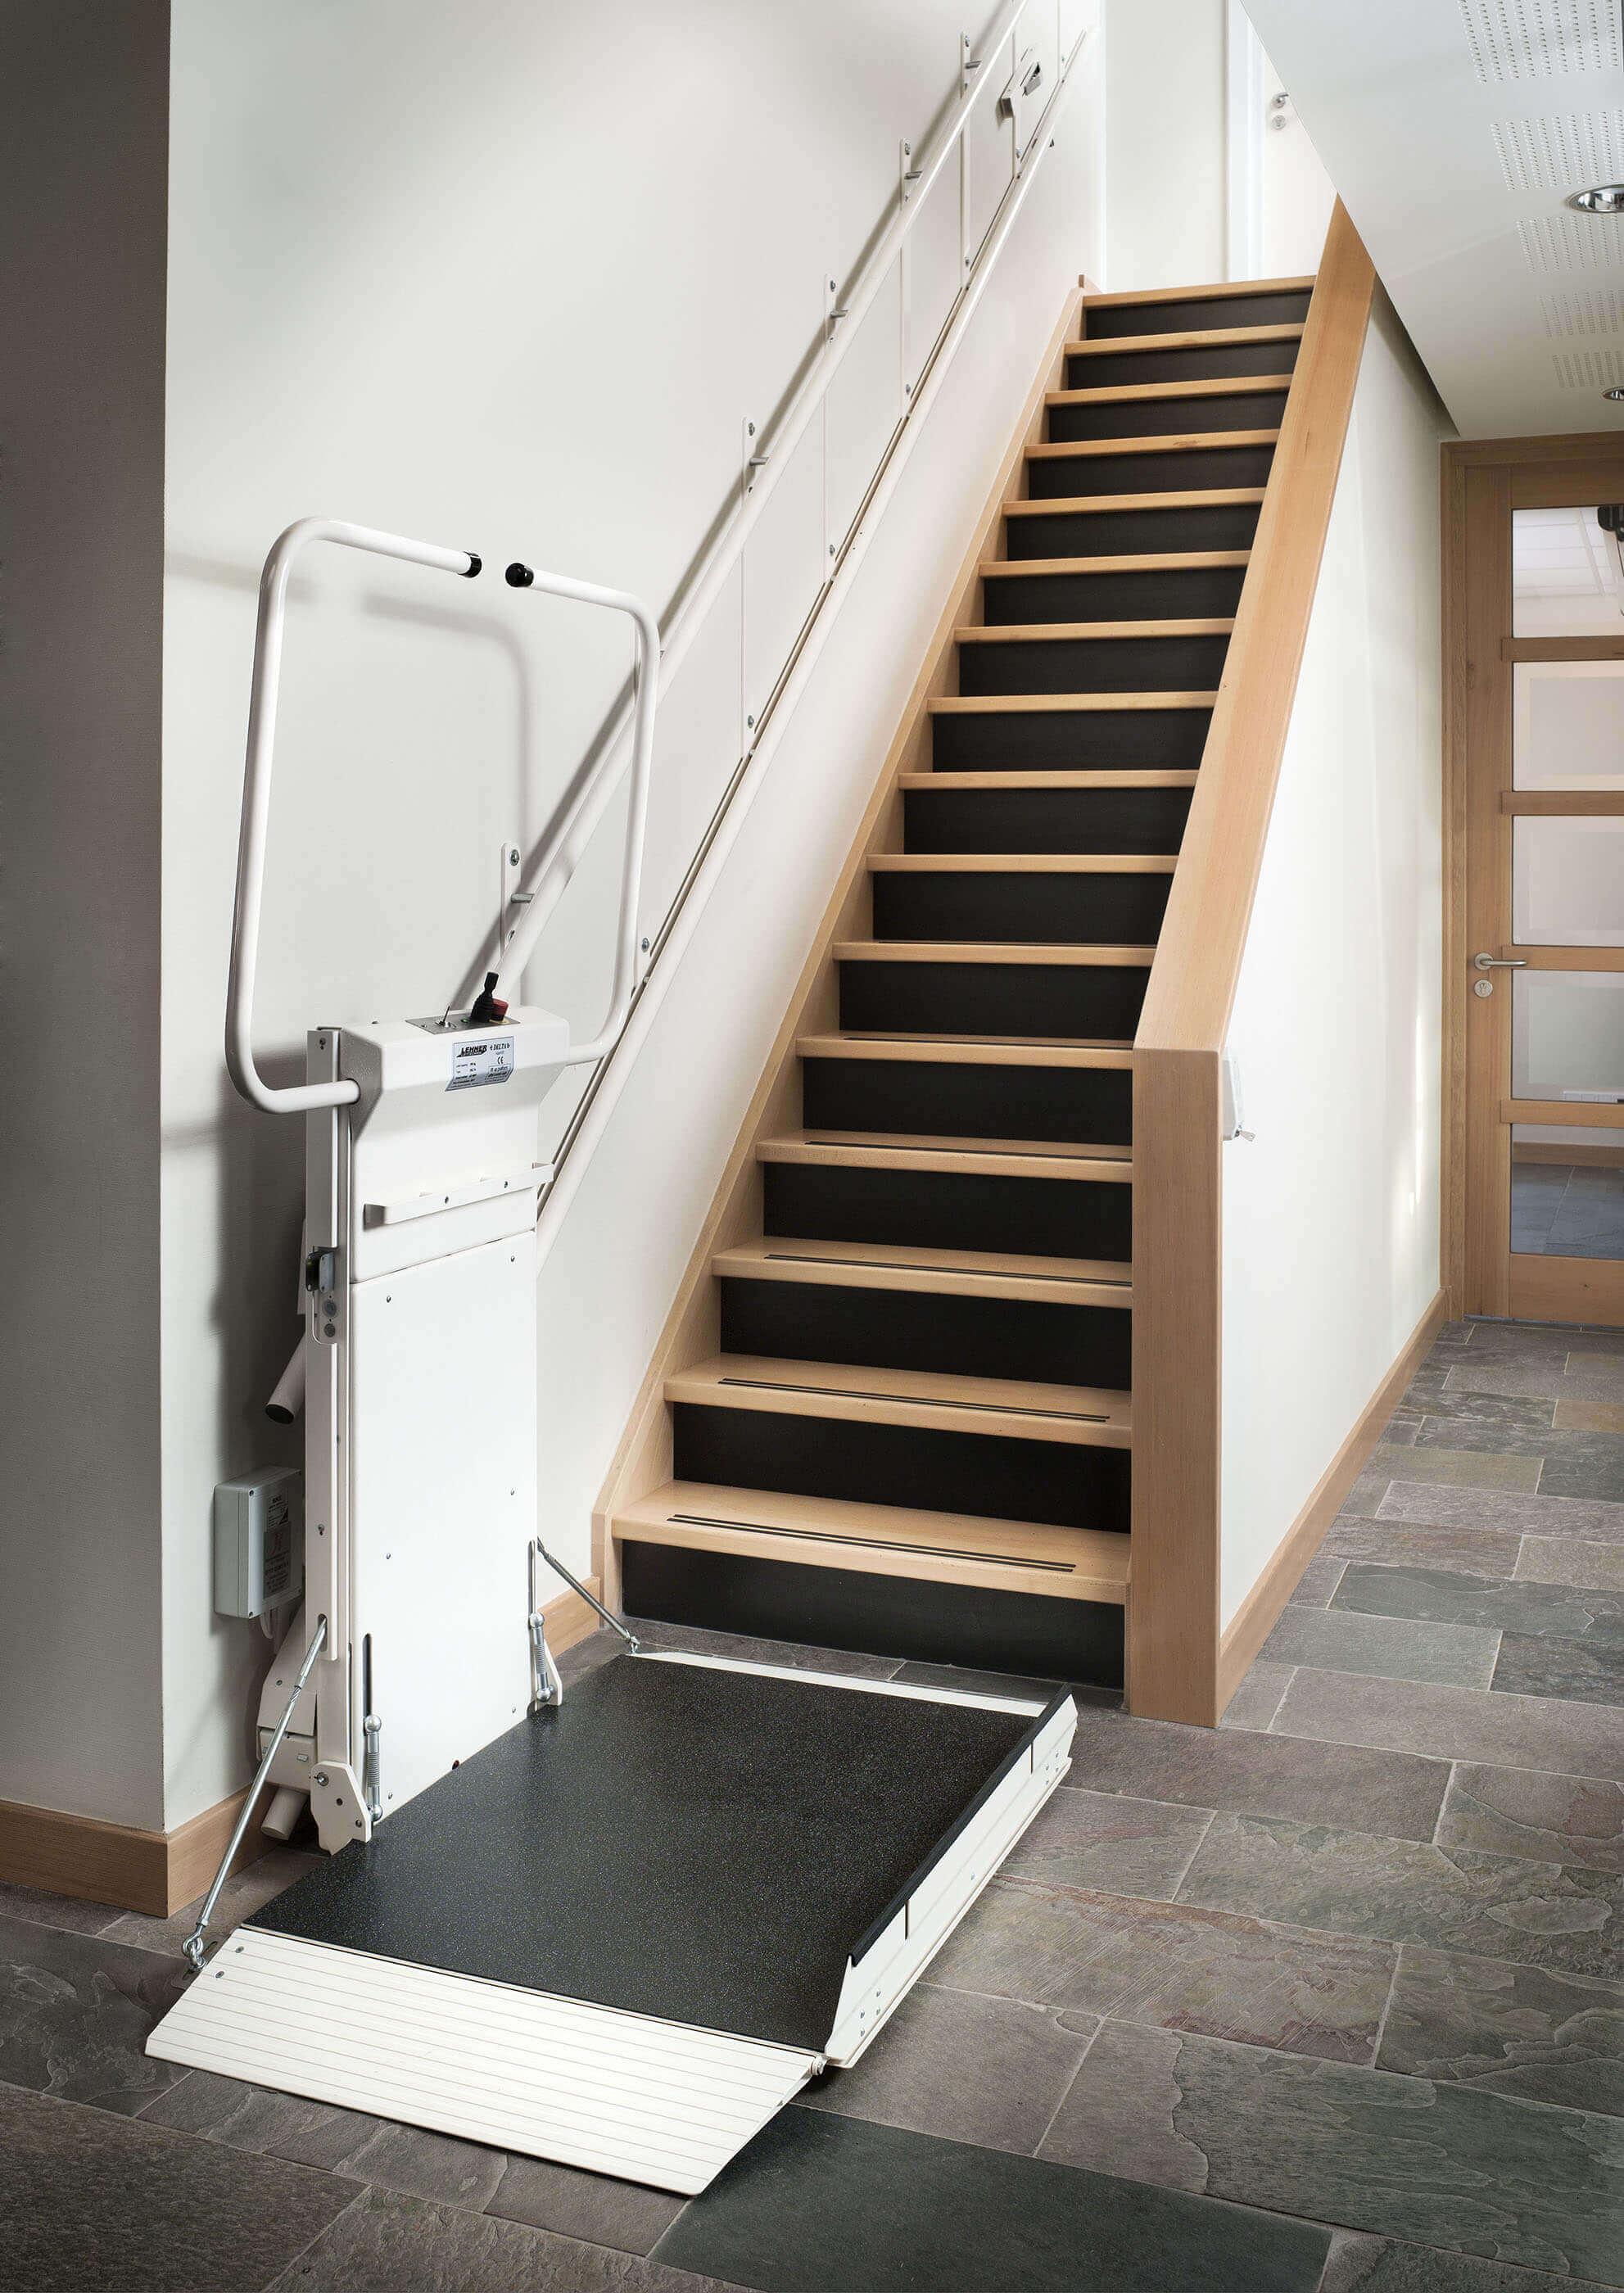 Plateforme monte-escalier en bas d'un escalier raide